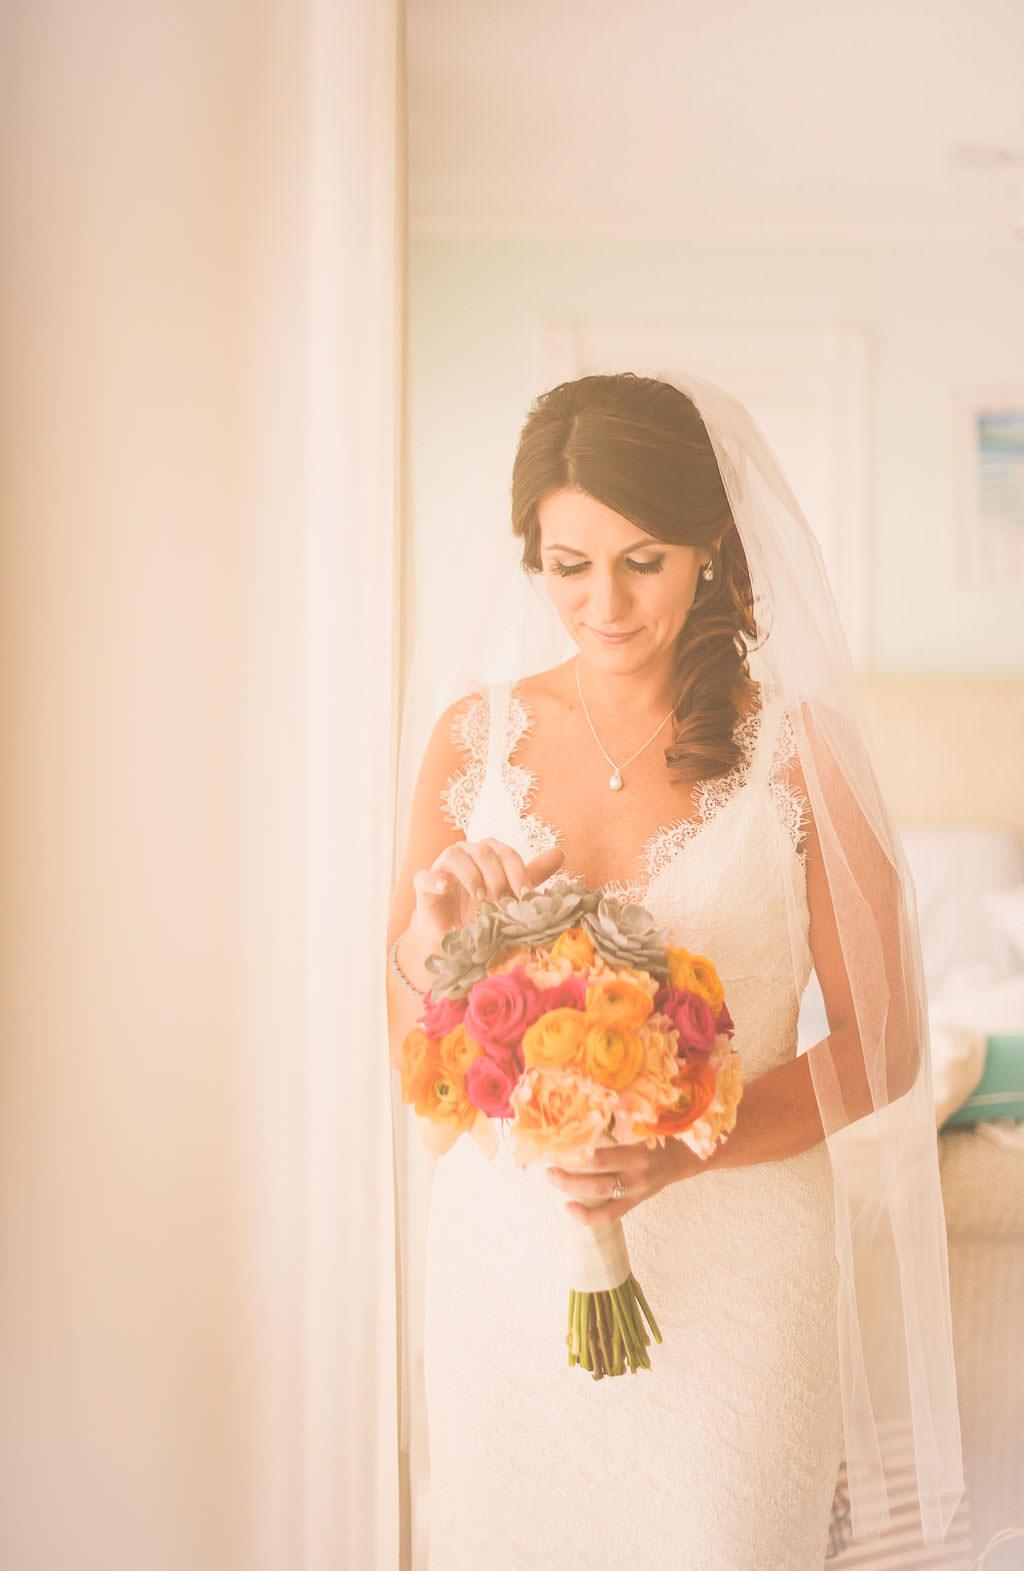 wedding-bouquets-108